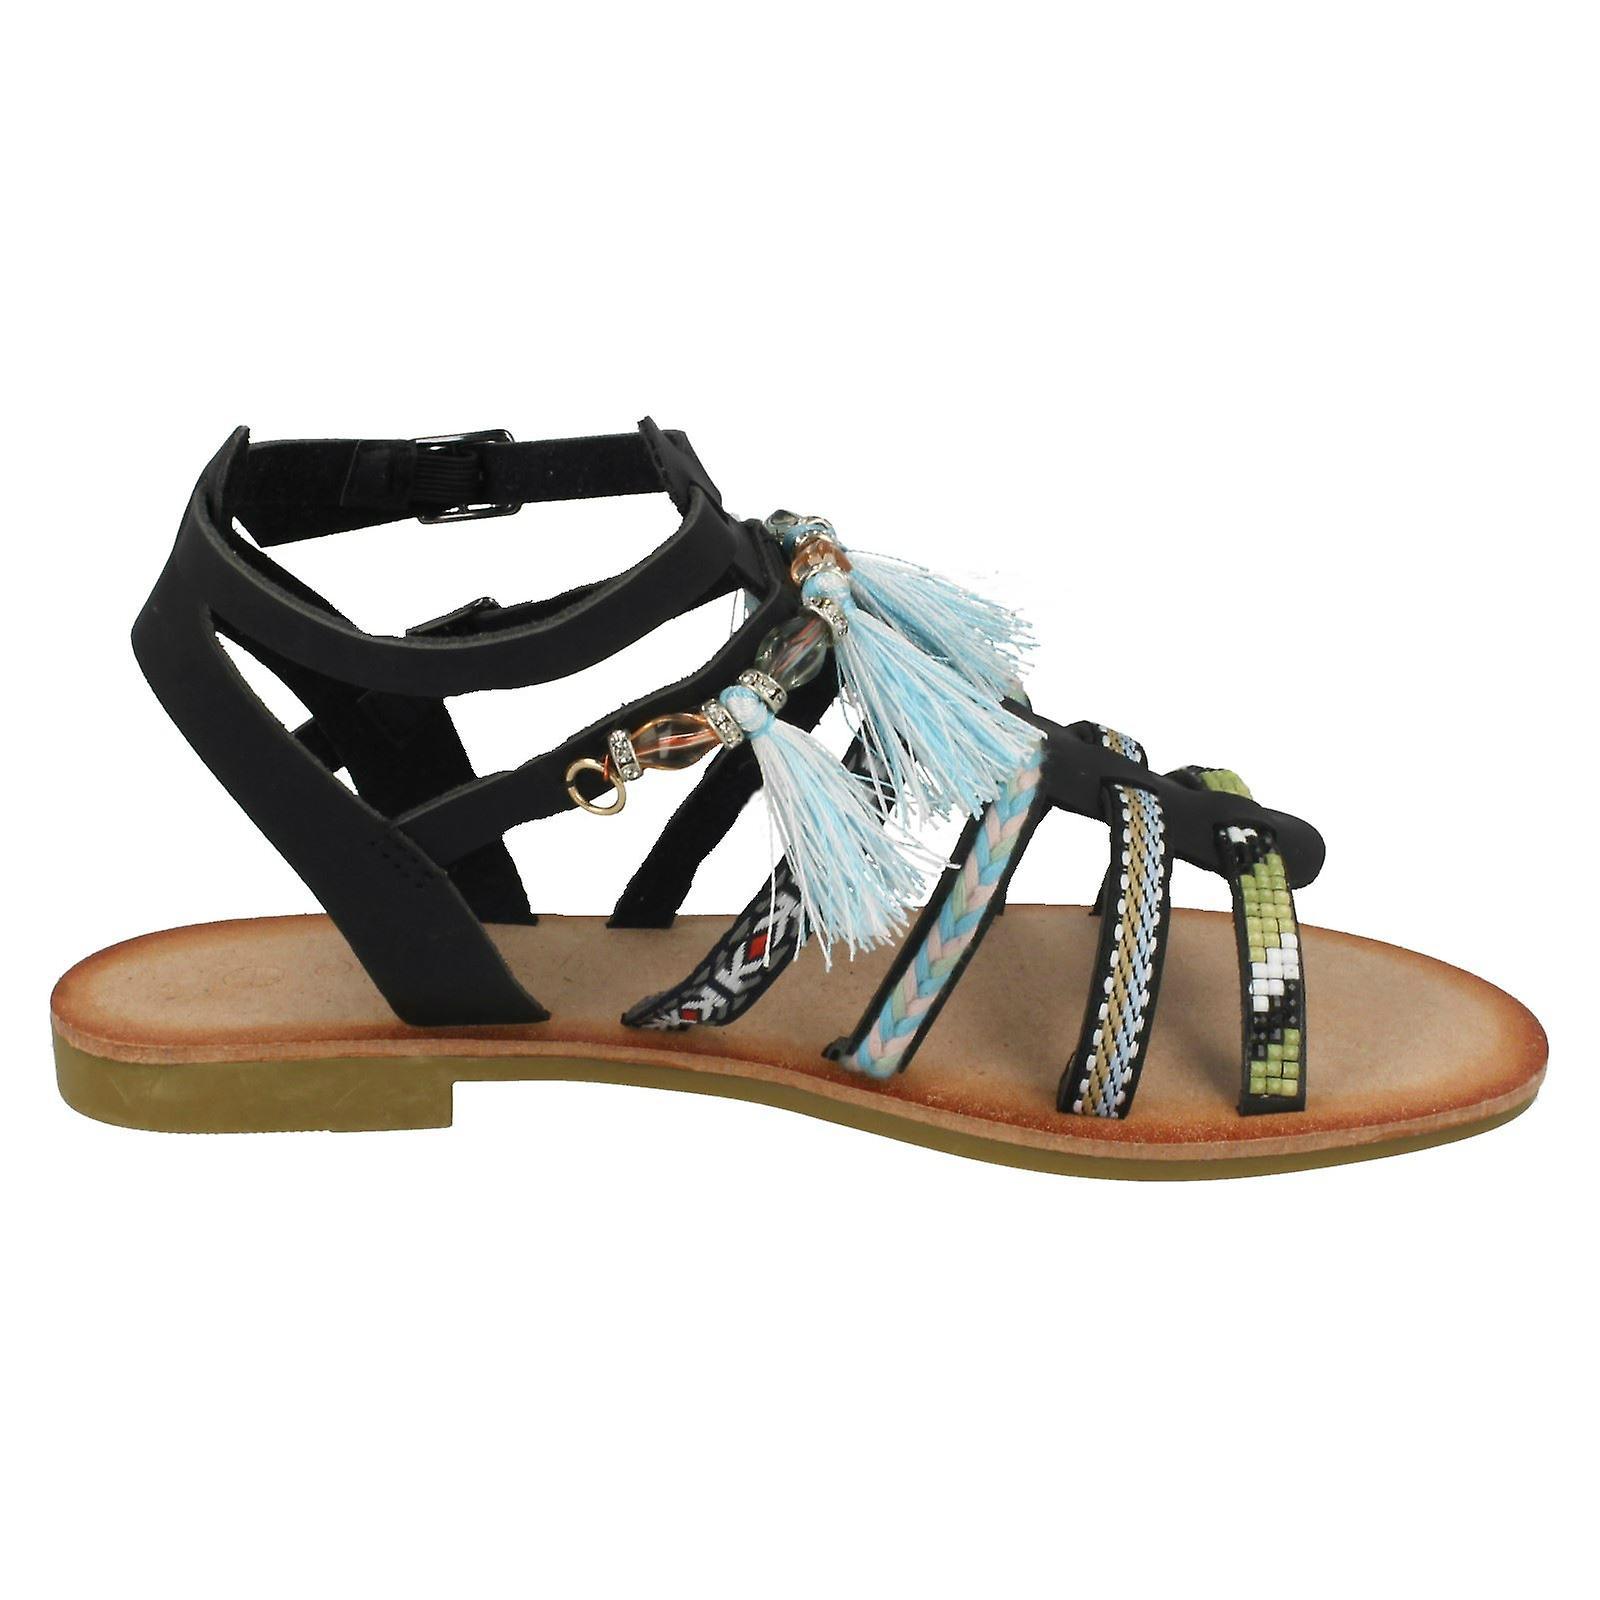 Savannah Beaded Strappy Sandals Ladies Flat F00005 dnfqWP04P